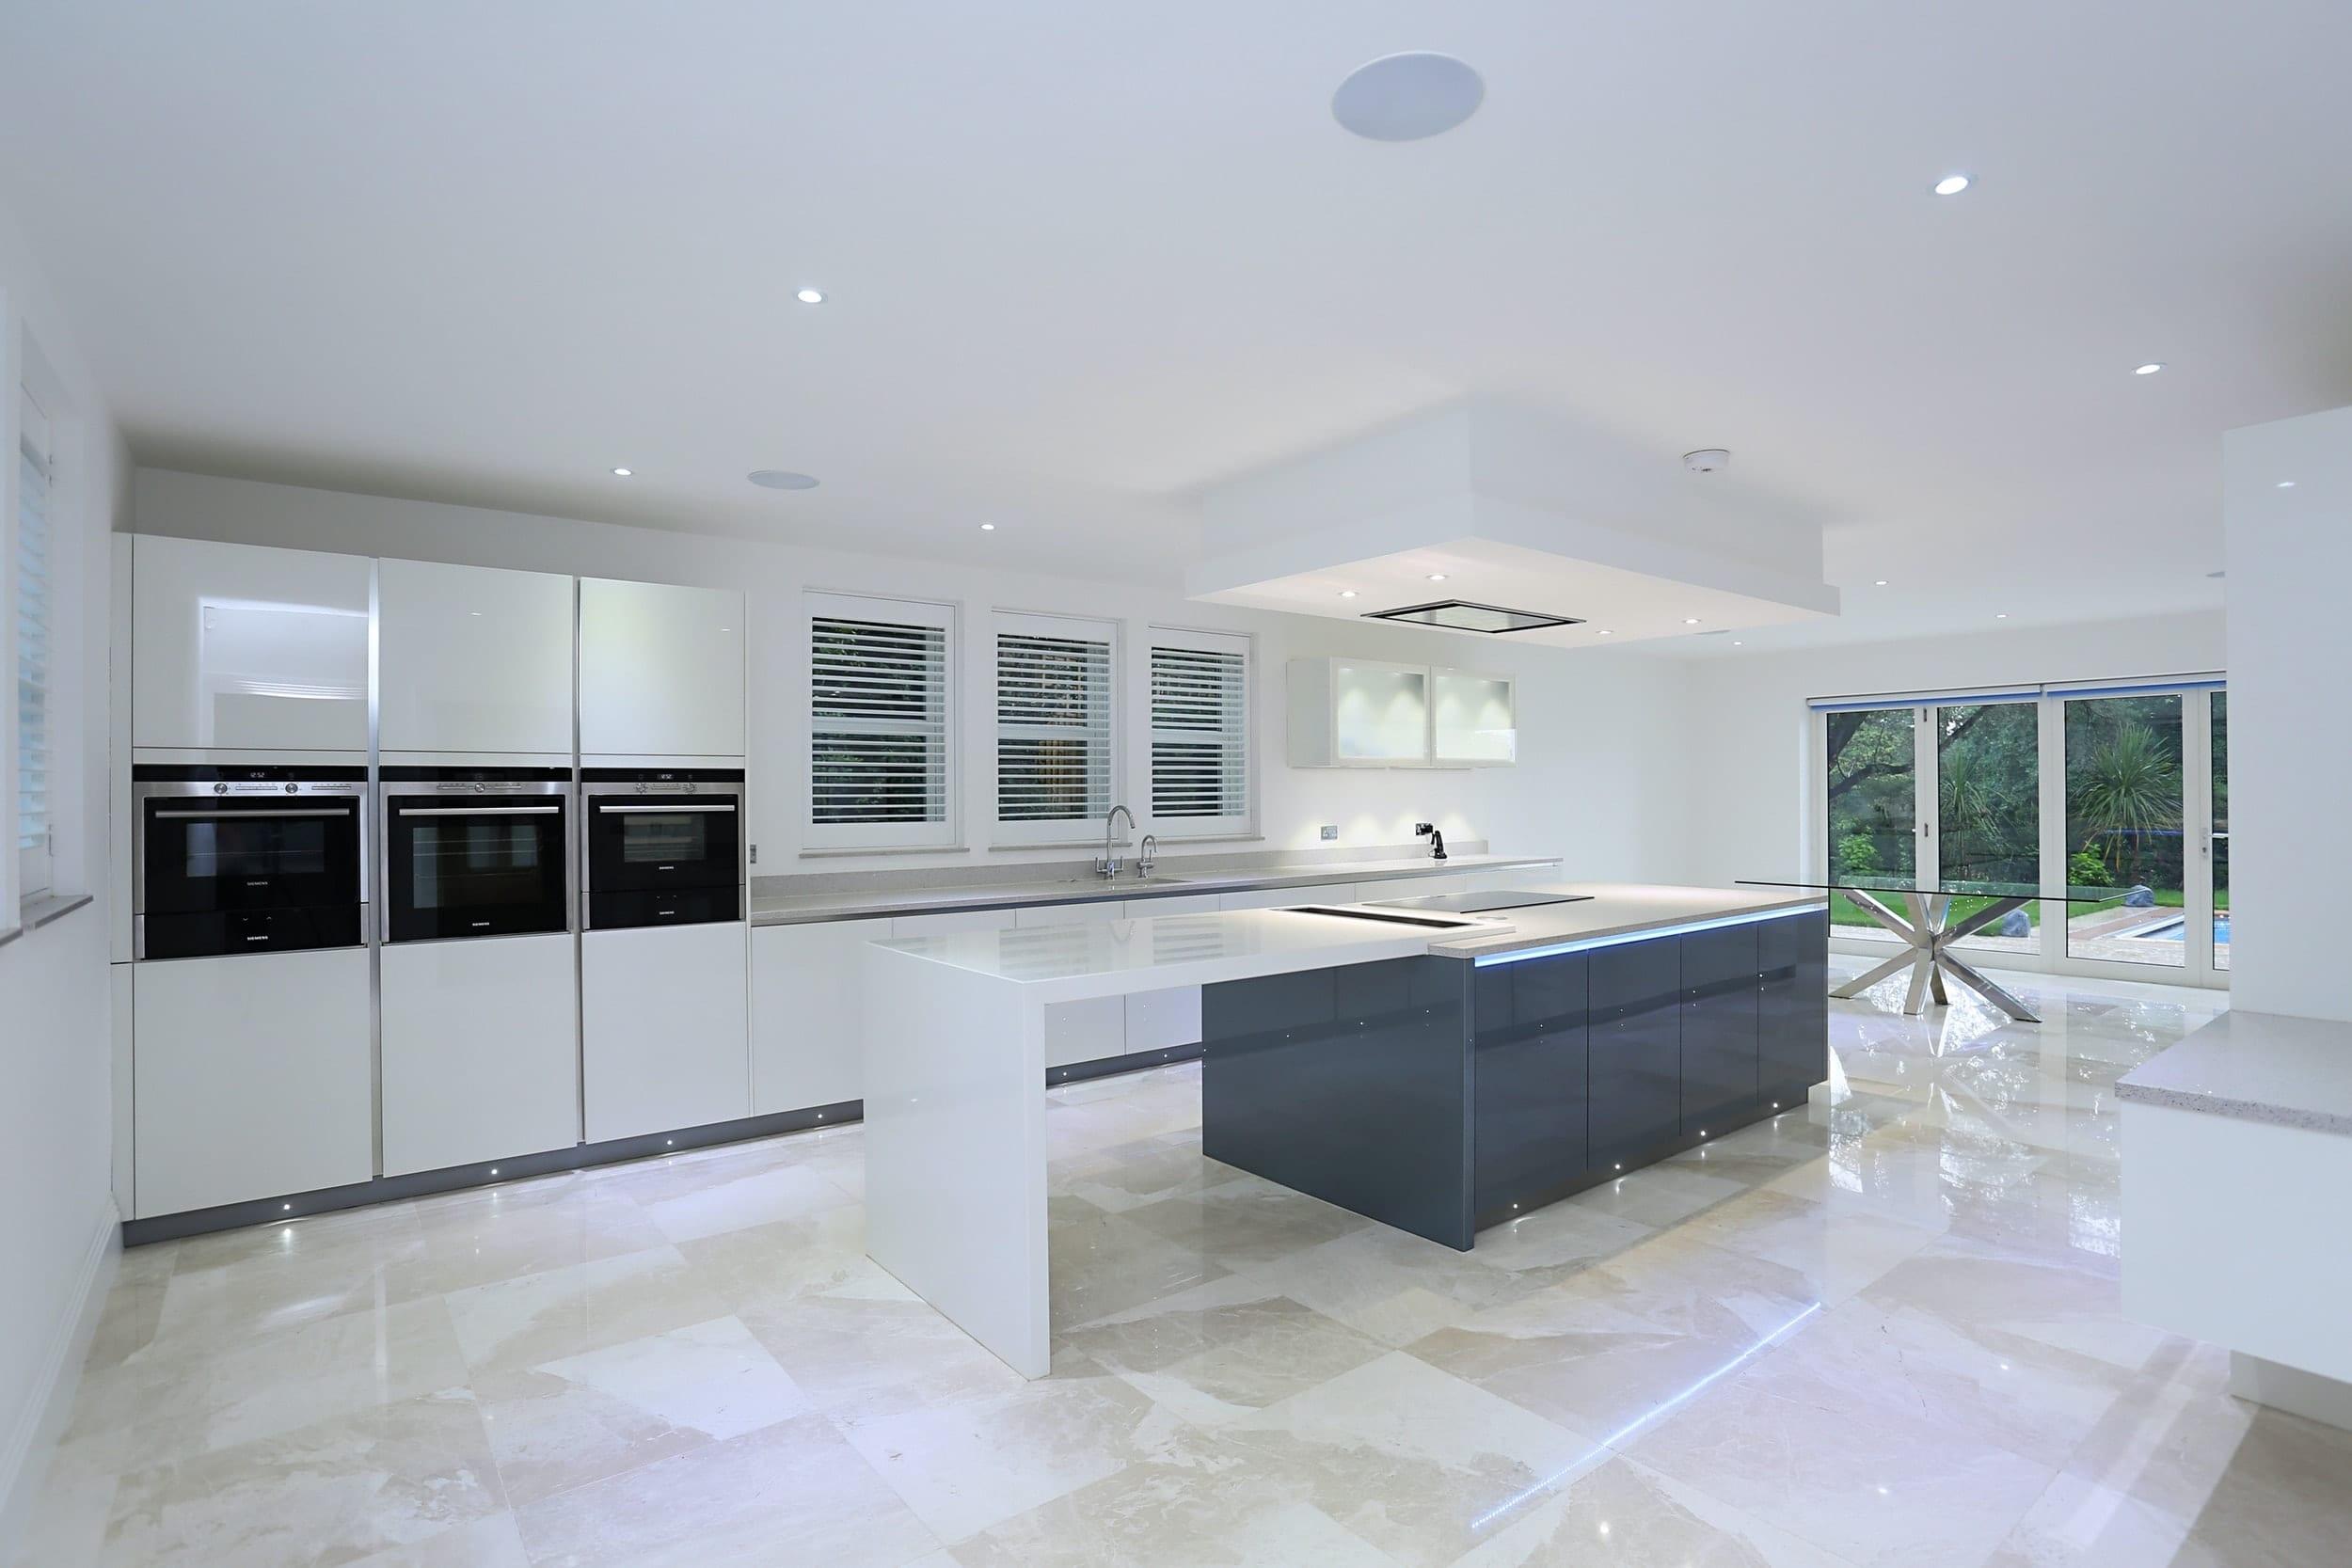 1. Handleless glass kitchen design 1 - Kitchen Revolutions, South London